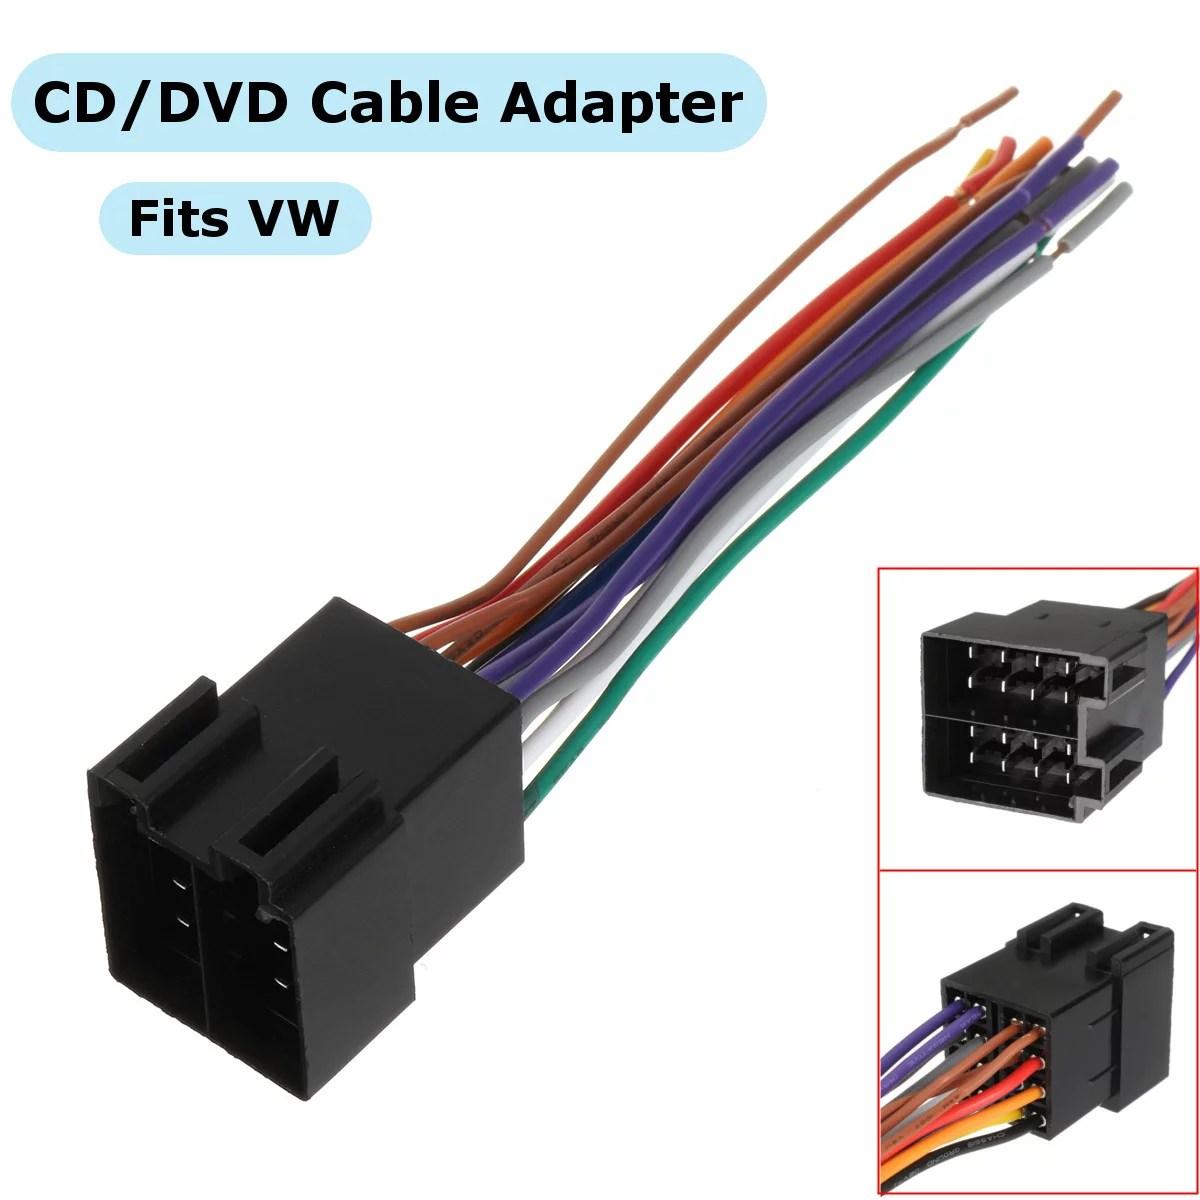 medium resolution of car stereo cd player wiring harness wire aftermarket radio install volkswagen car stereo cd player wiring harness wire aftermarket radio